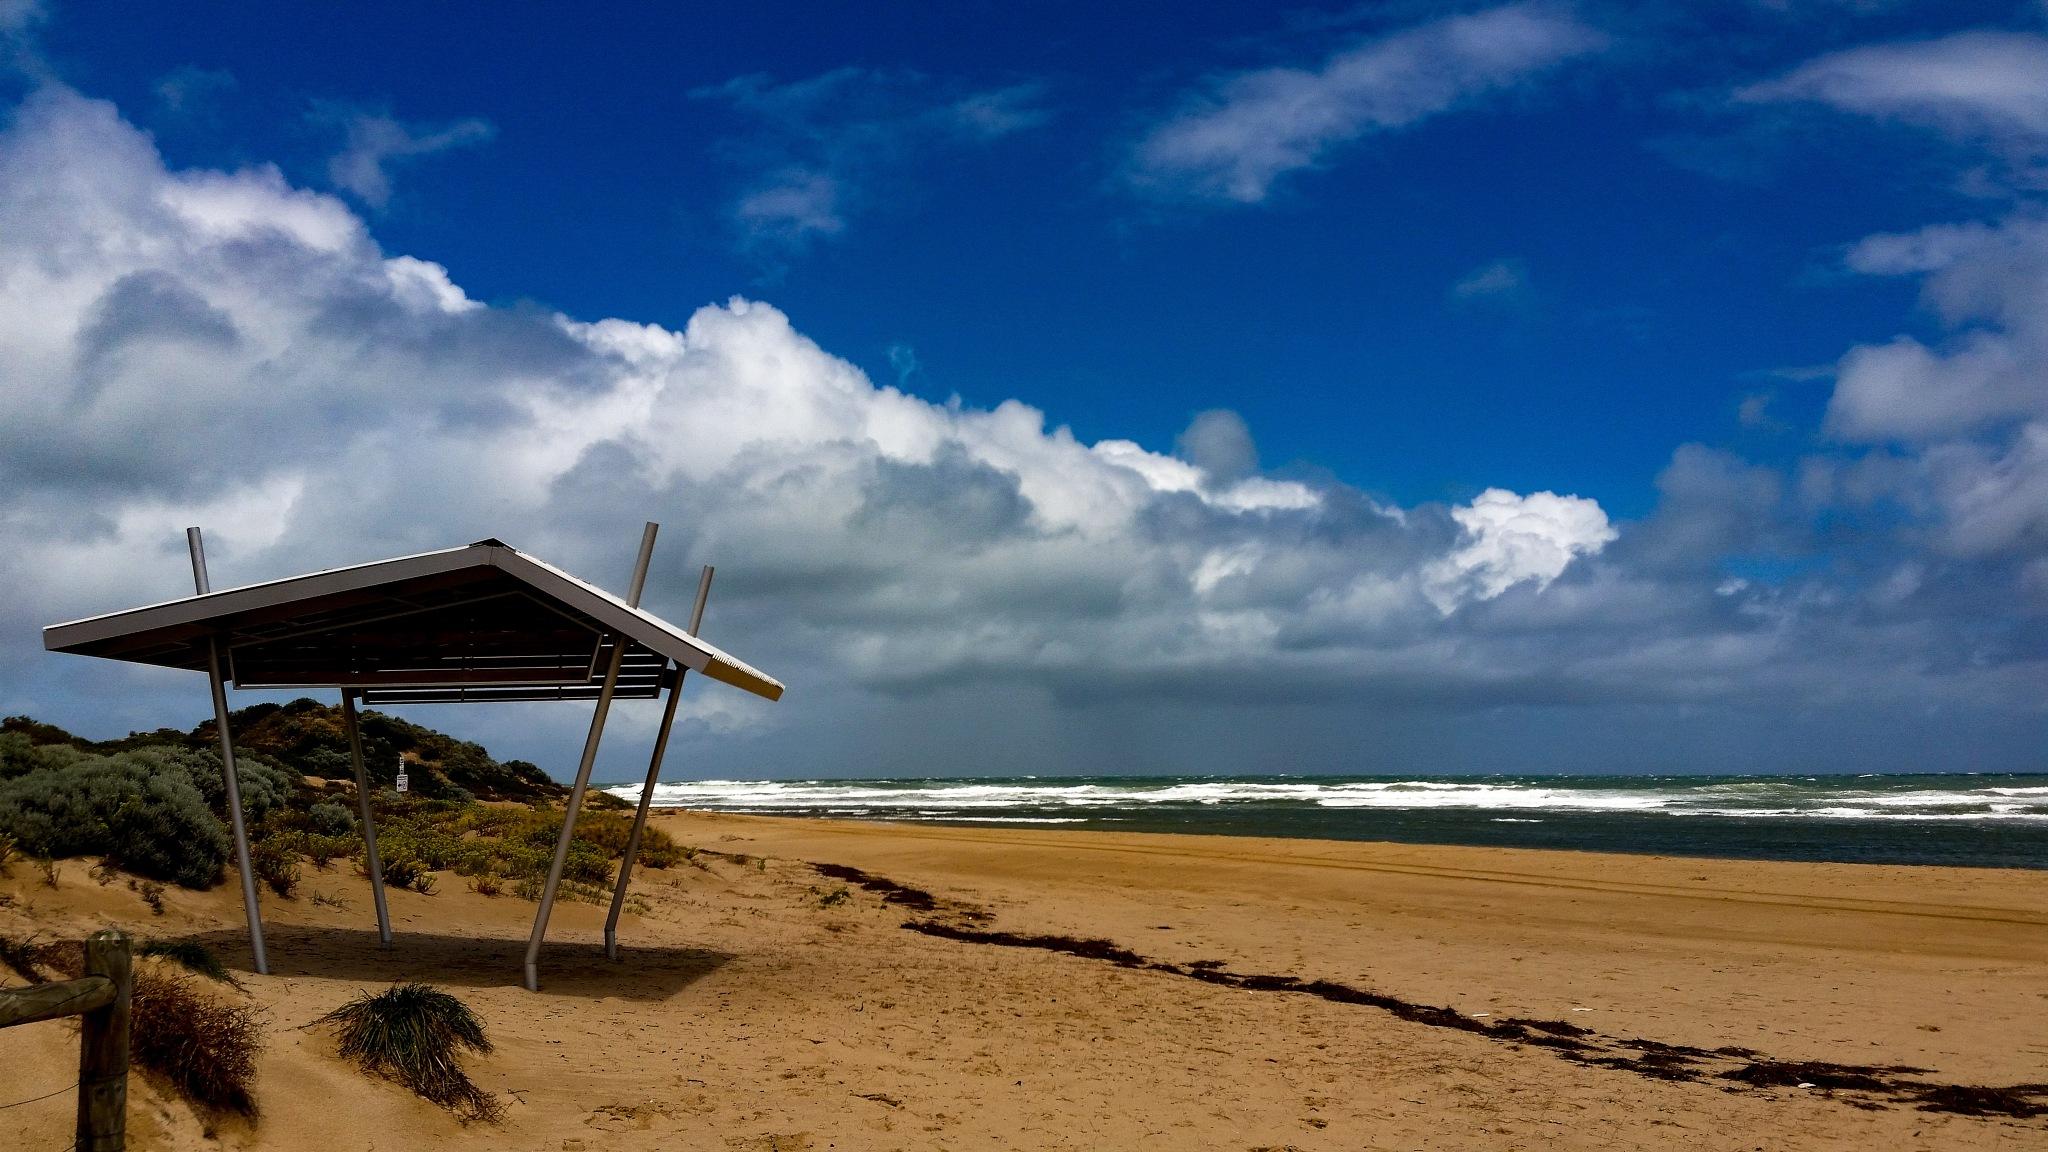 Avalon Beach MANDURAH Western Australia  by Russell Edmunds